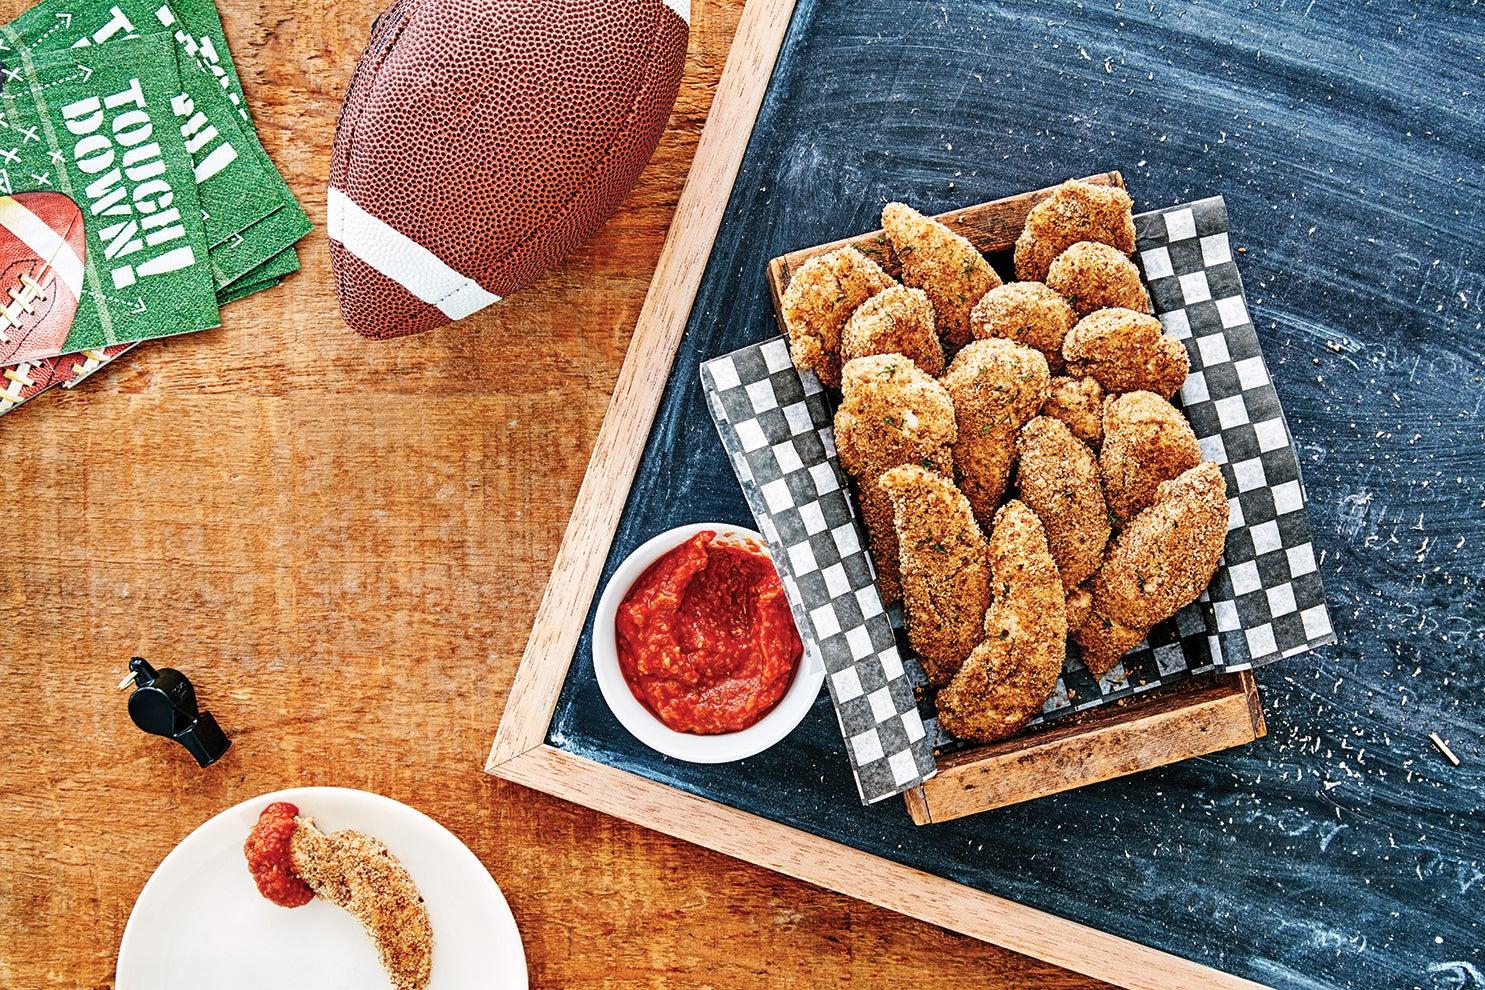 Super Snacks for Super Bowl Sunday